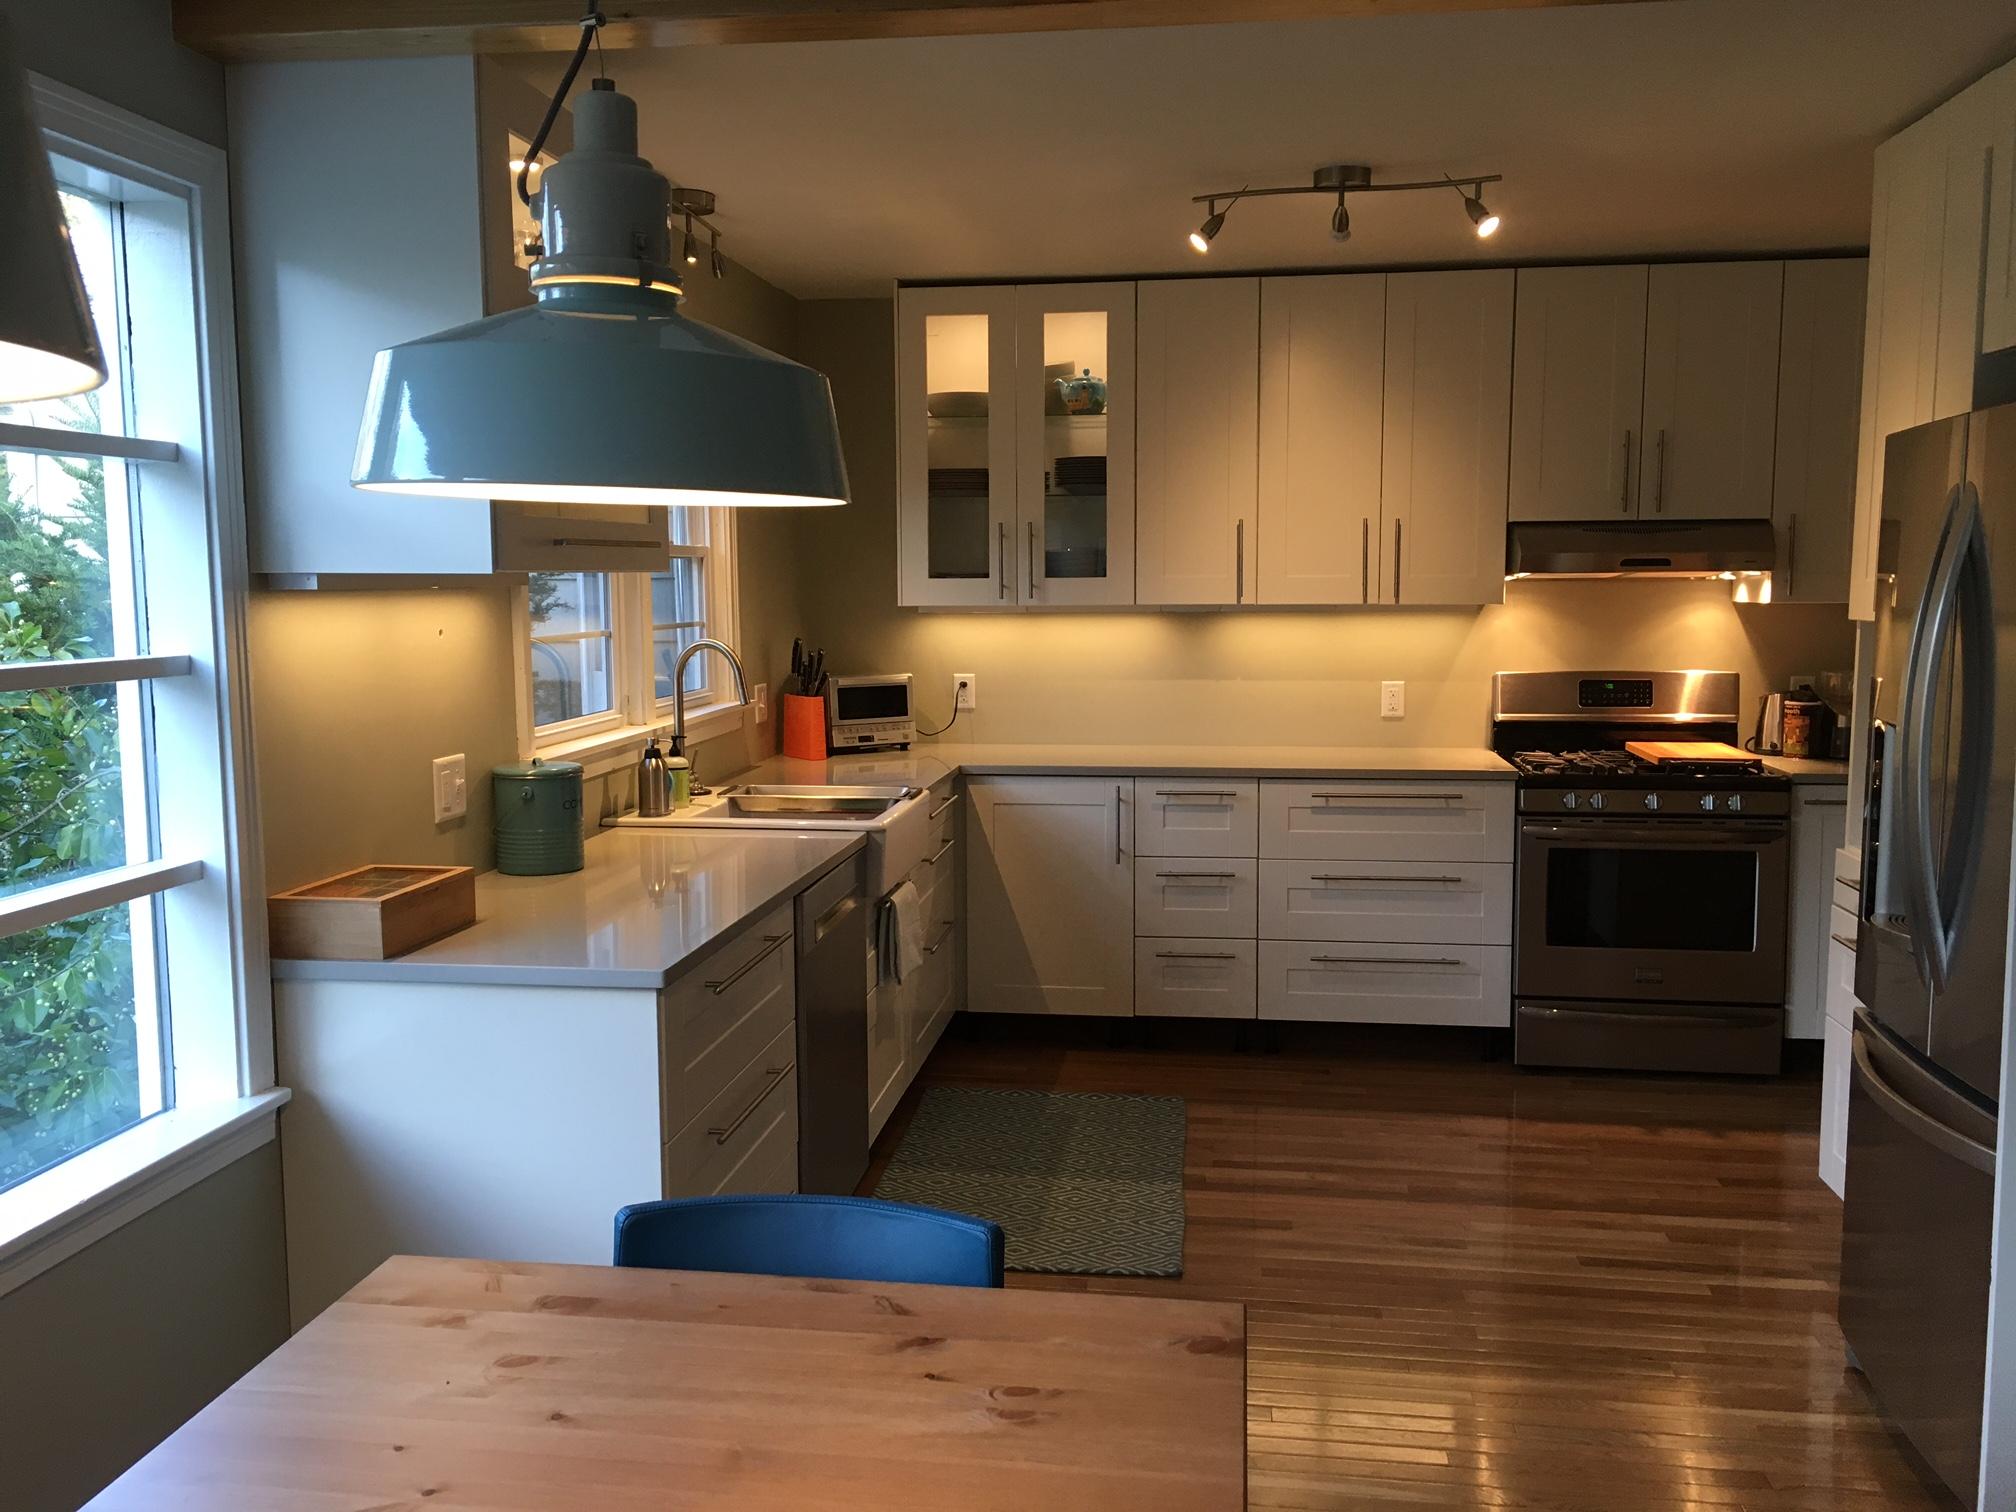 modern ikea kitchen renovation ny ikea kitchen design ikd ikea modern kitchen makeover 6